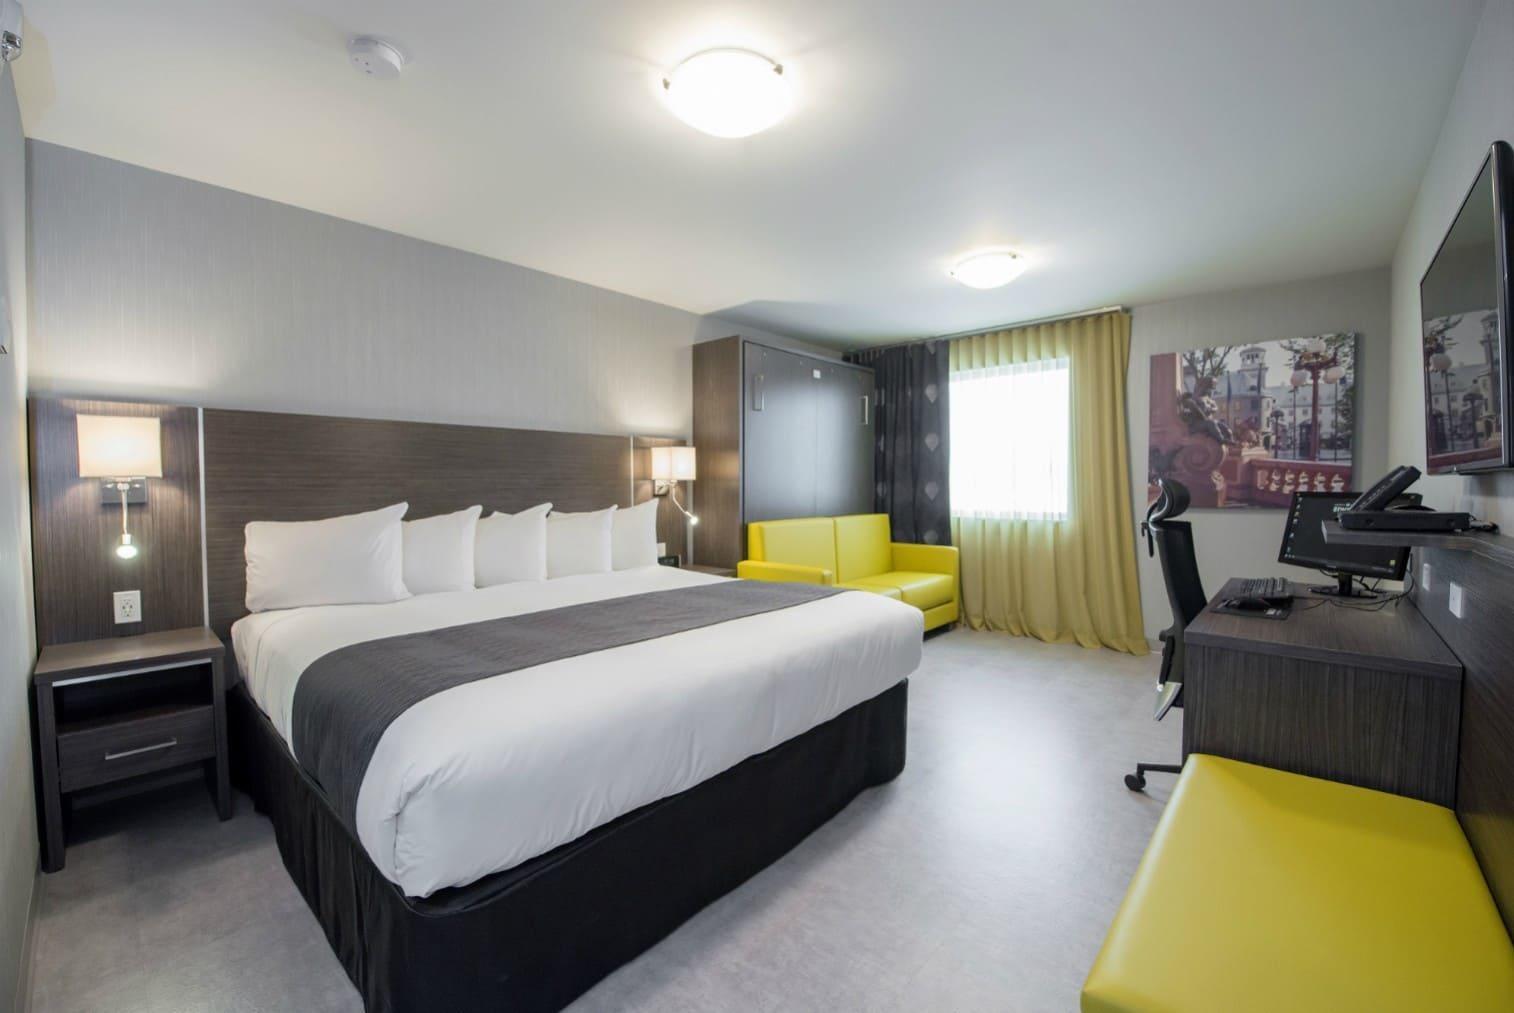 Chambre hotel Quebec  Forfait hbergement